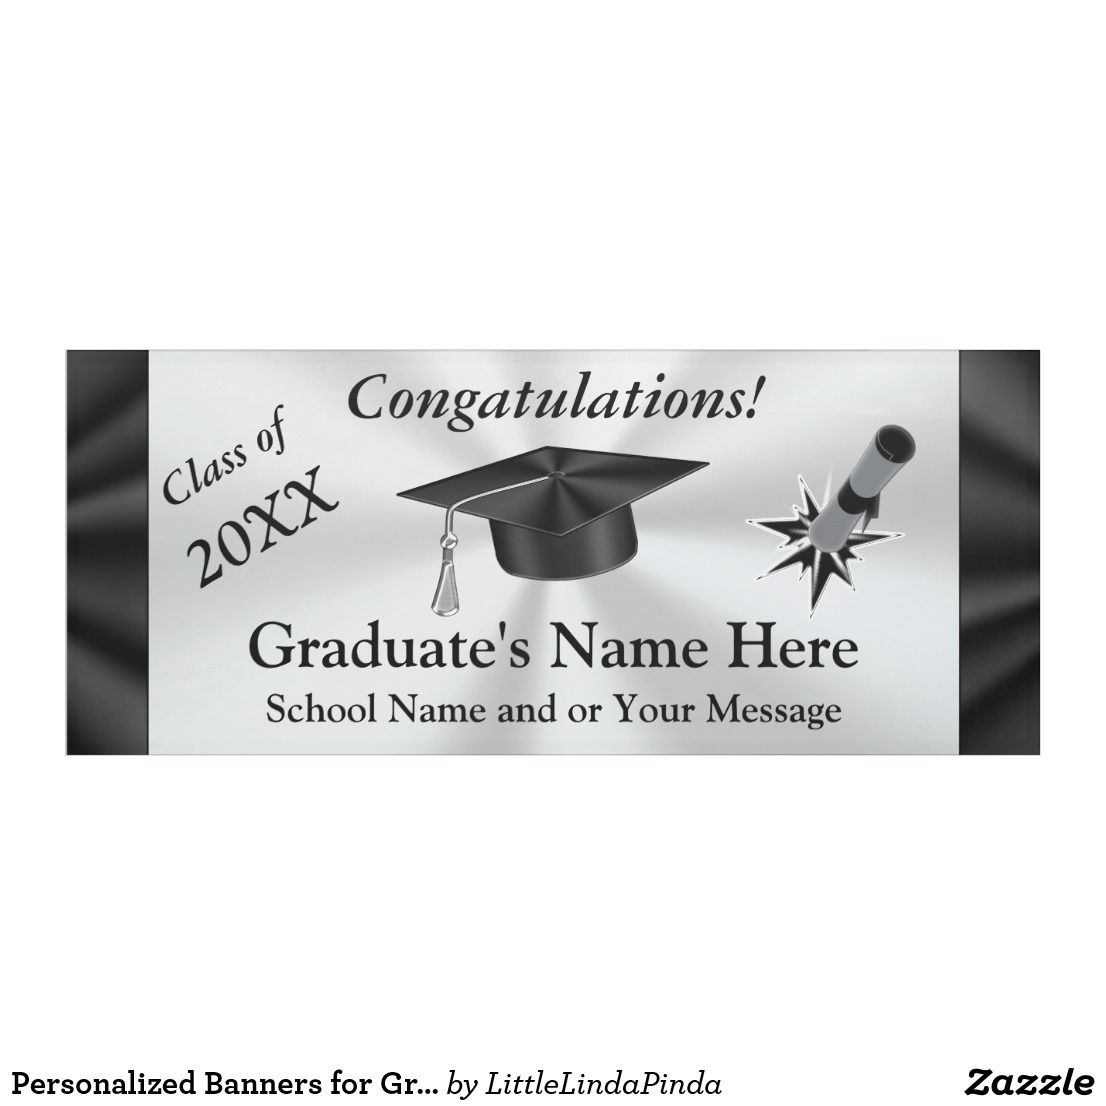 personalized graduation banners - Gidiye.redformapolitica.co